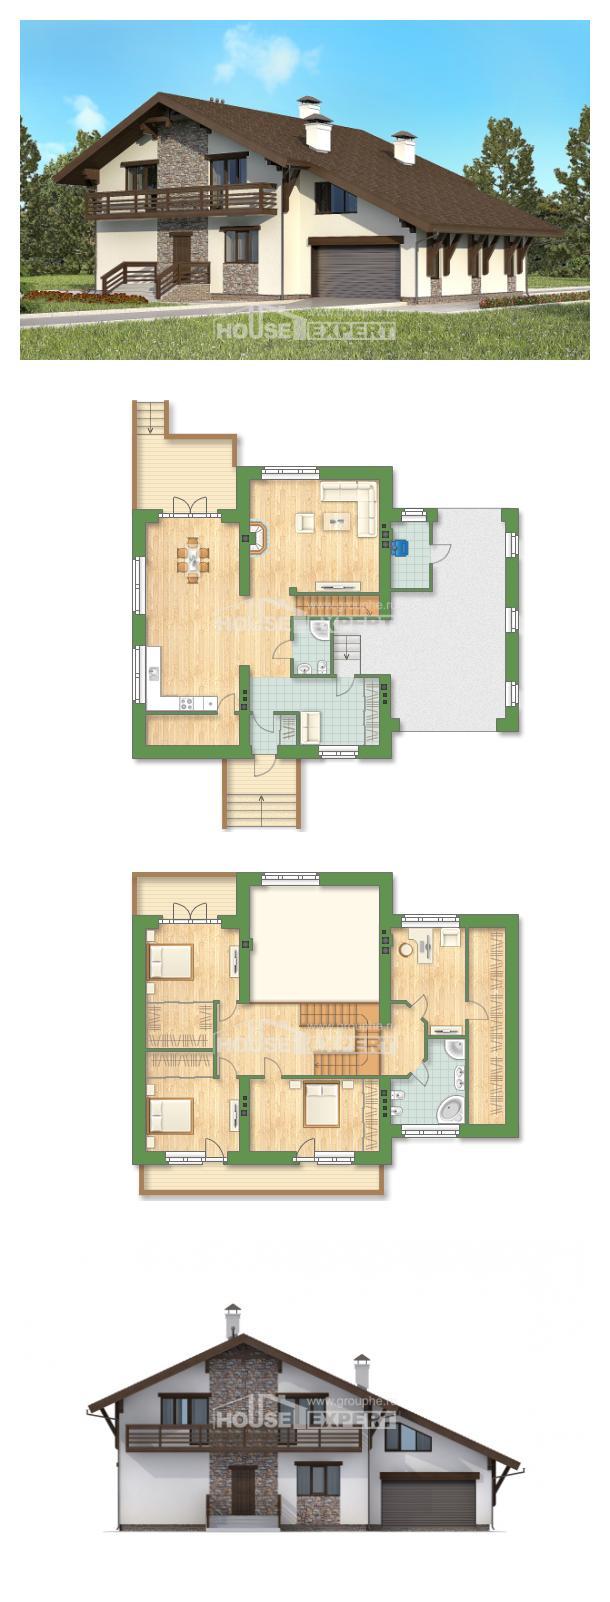 Projekt domu 280-001-R | House Expert